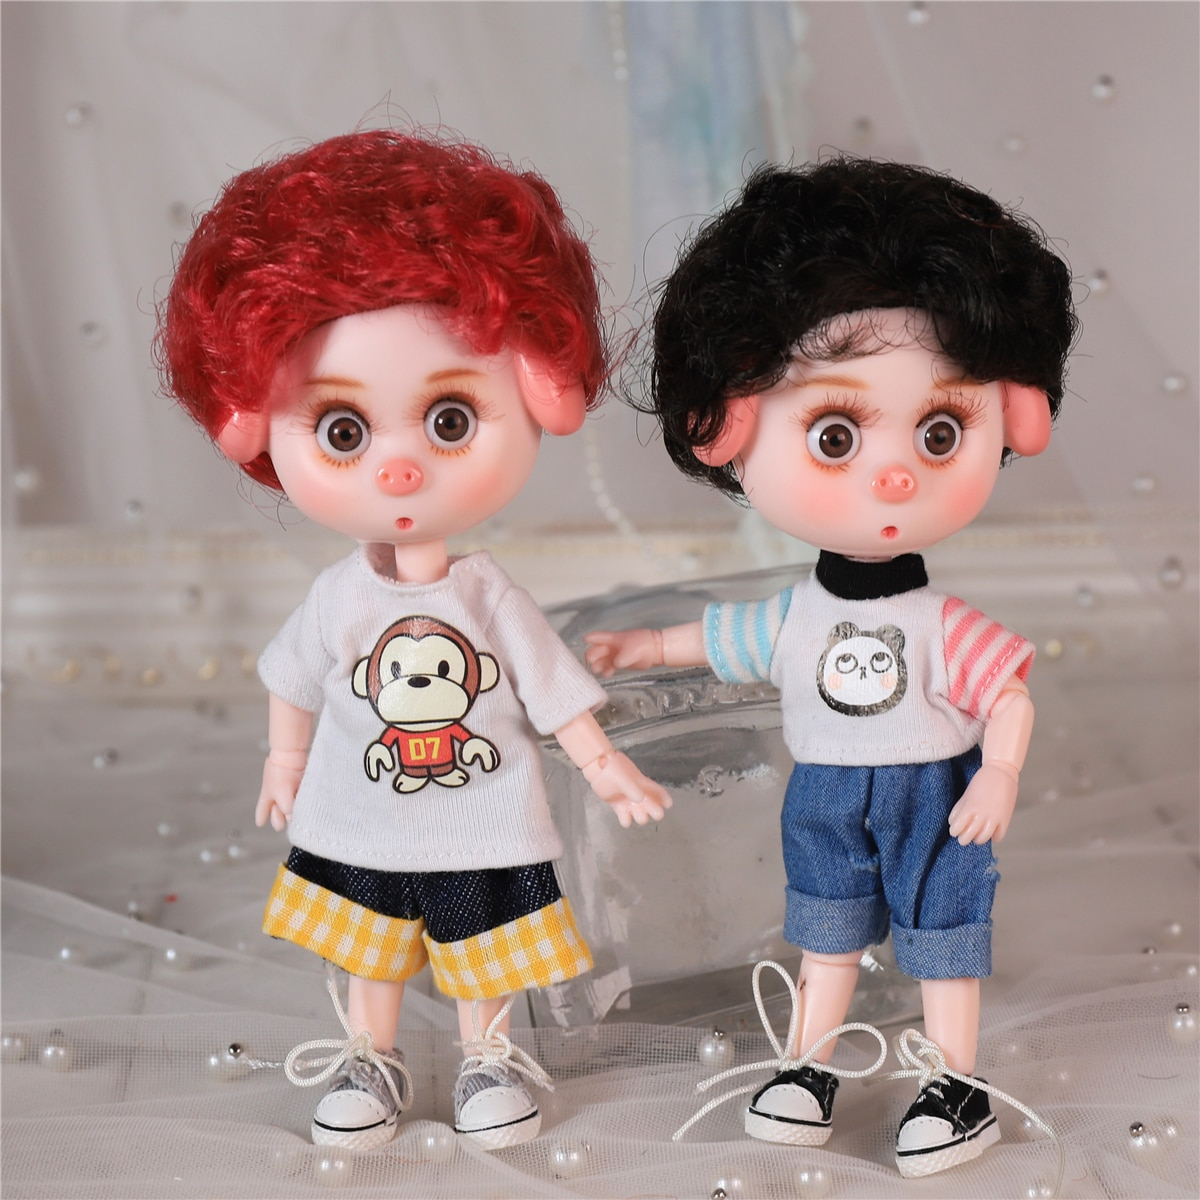 DBS Dream Fairy 1/12 BJD DODO doll 15cm doll toy ob11 mini doll with clothes shoes